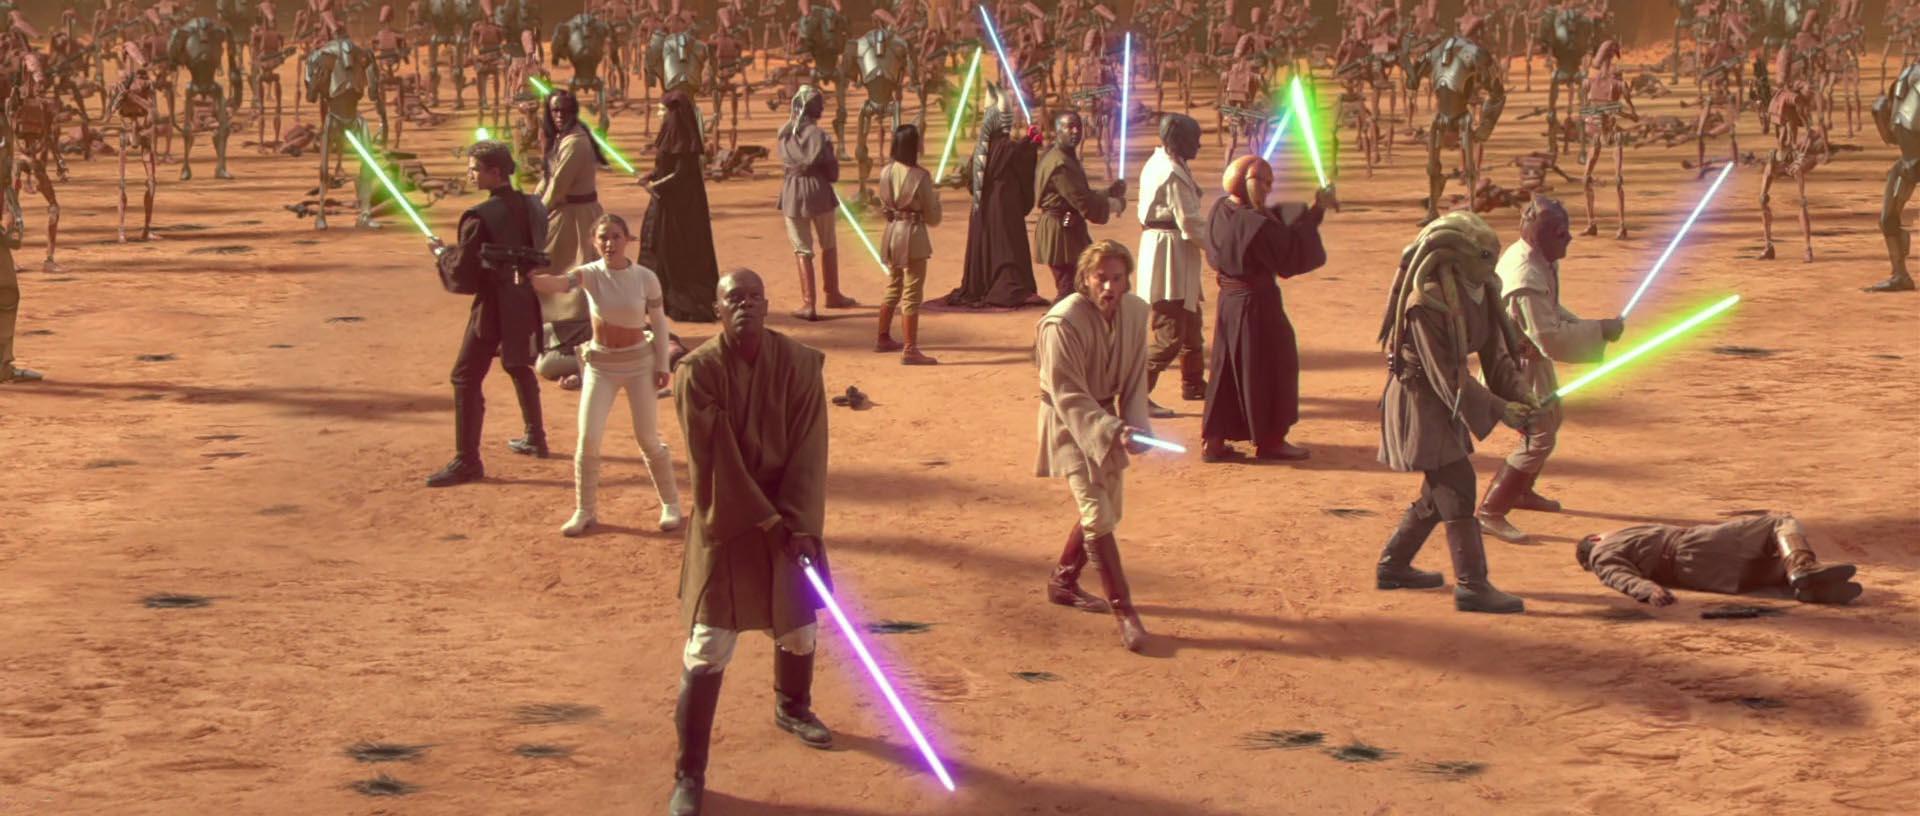 Obramba jedijev v areni v filmu Vojna zvezd napad klonov (Star Wars Attack of the Clones)